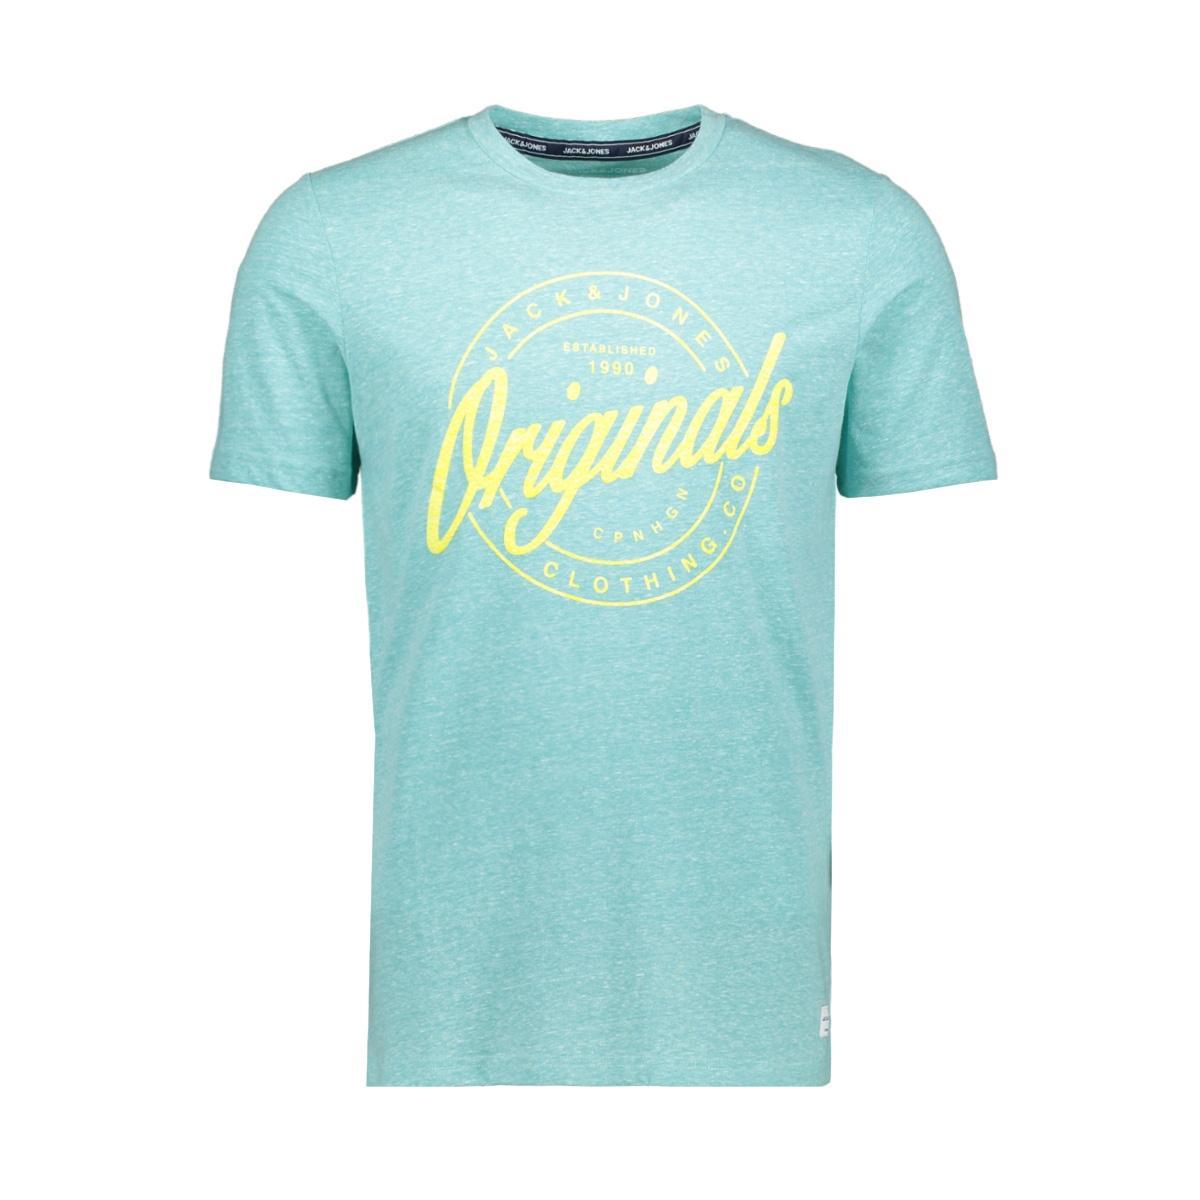 jorhazy tee ss crew neck 12152608 jack & jones t-shirt aqua sky